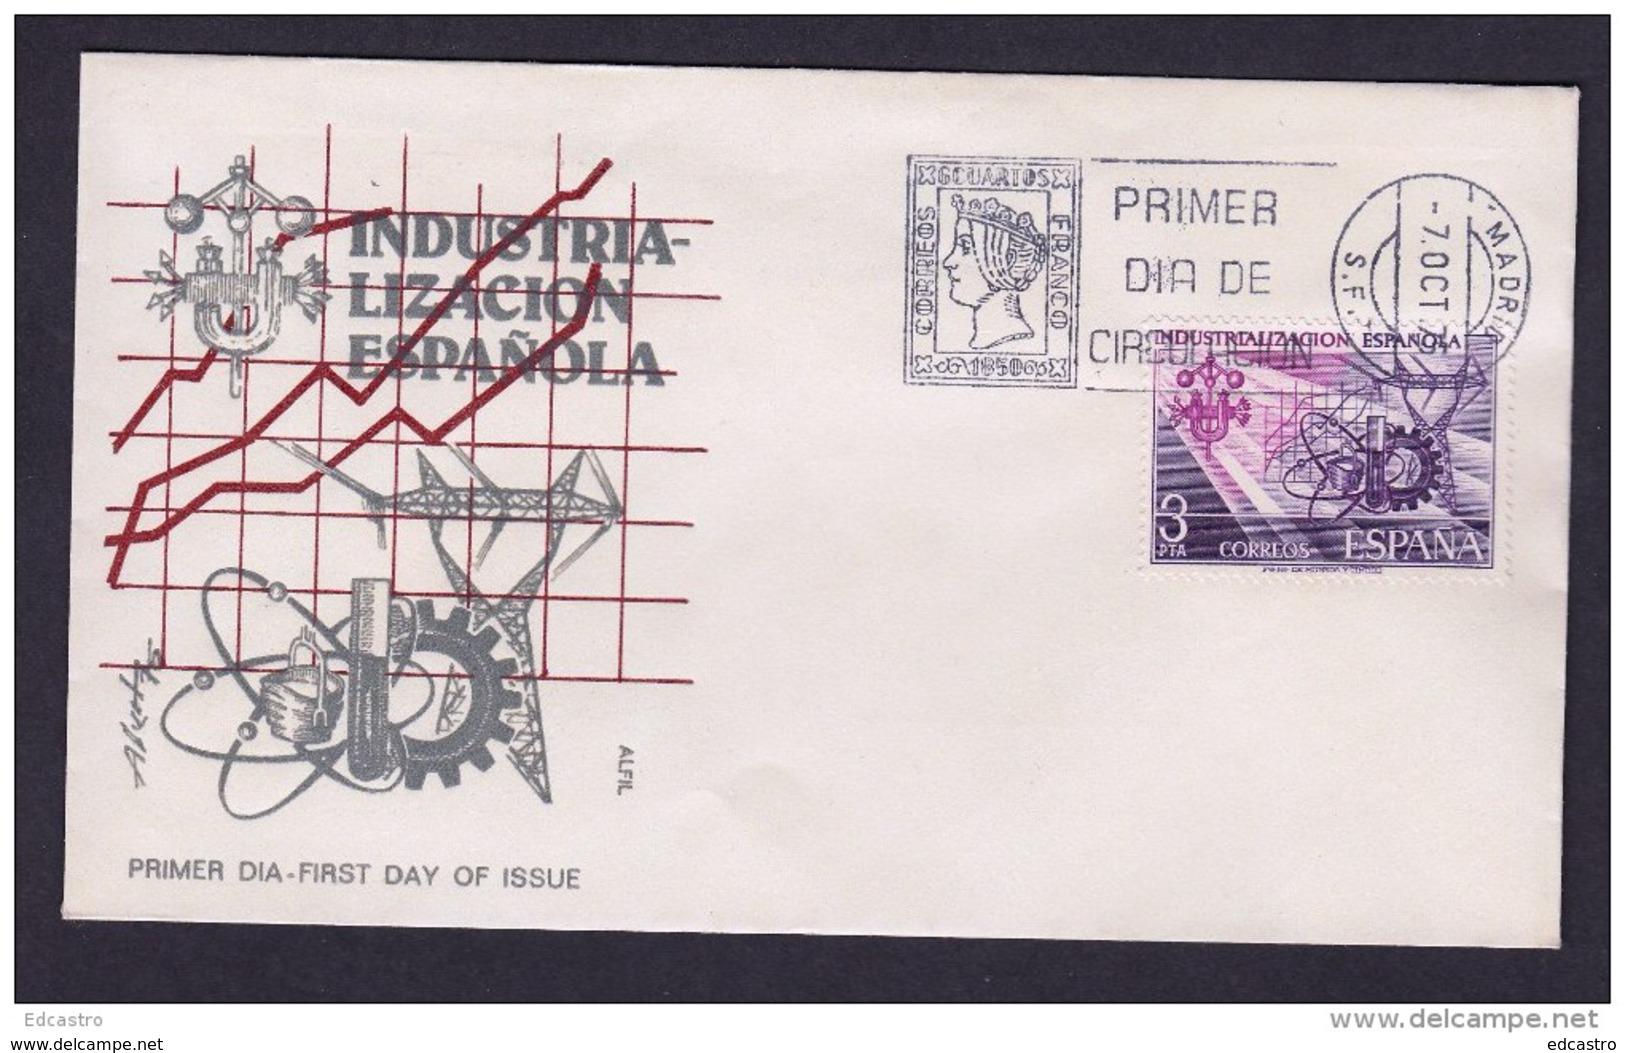 SPAIN ESPAGNE 1975 FDC SPANISH INDUSTRIALIZATION - Fábricas Y Industrias